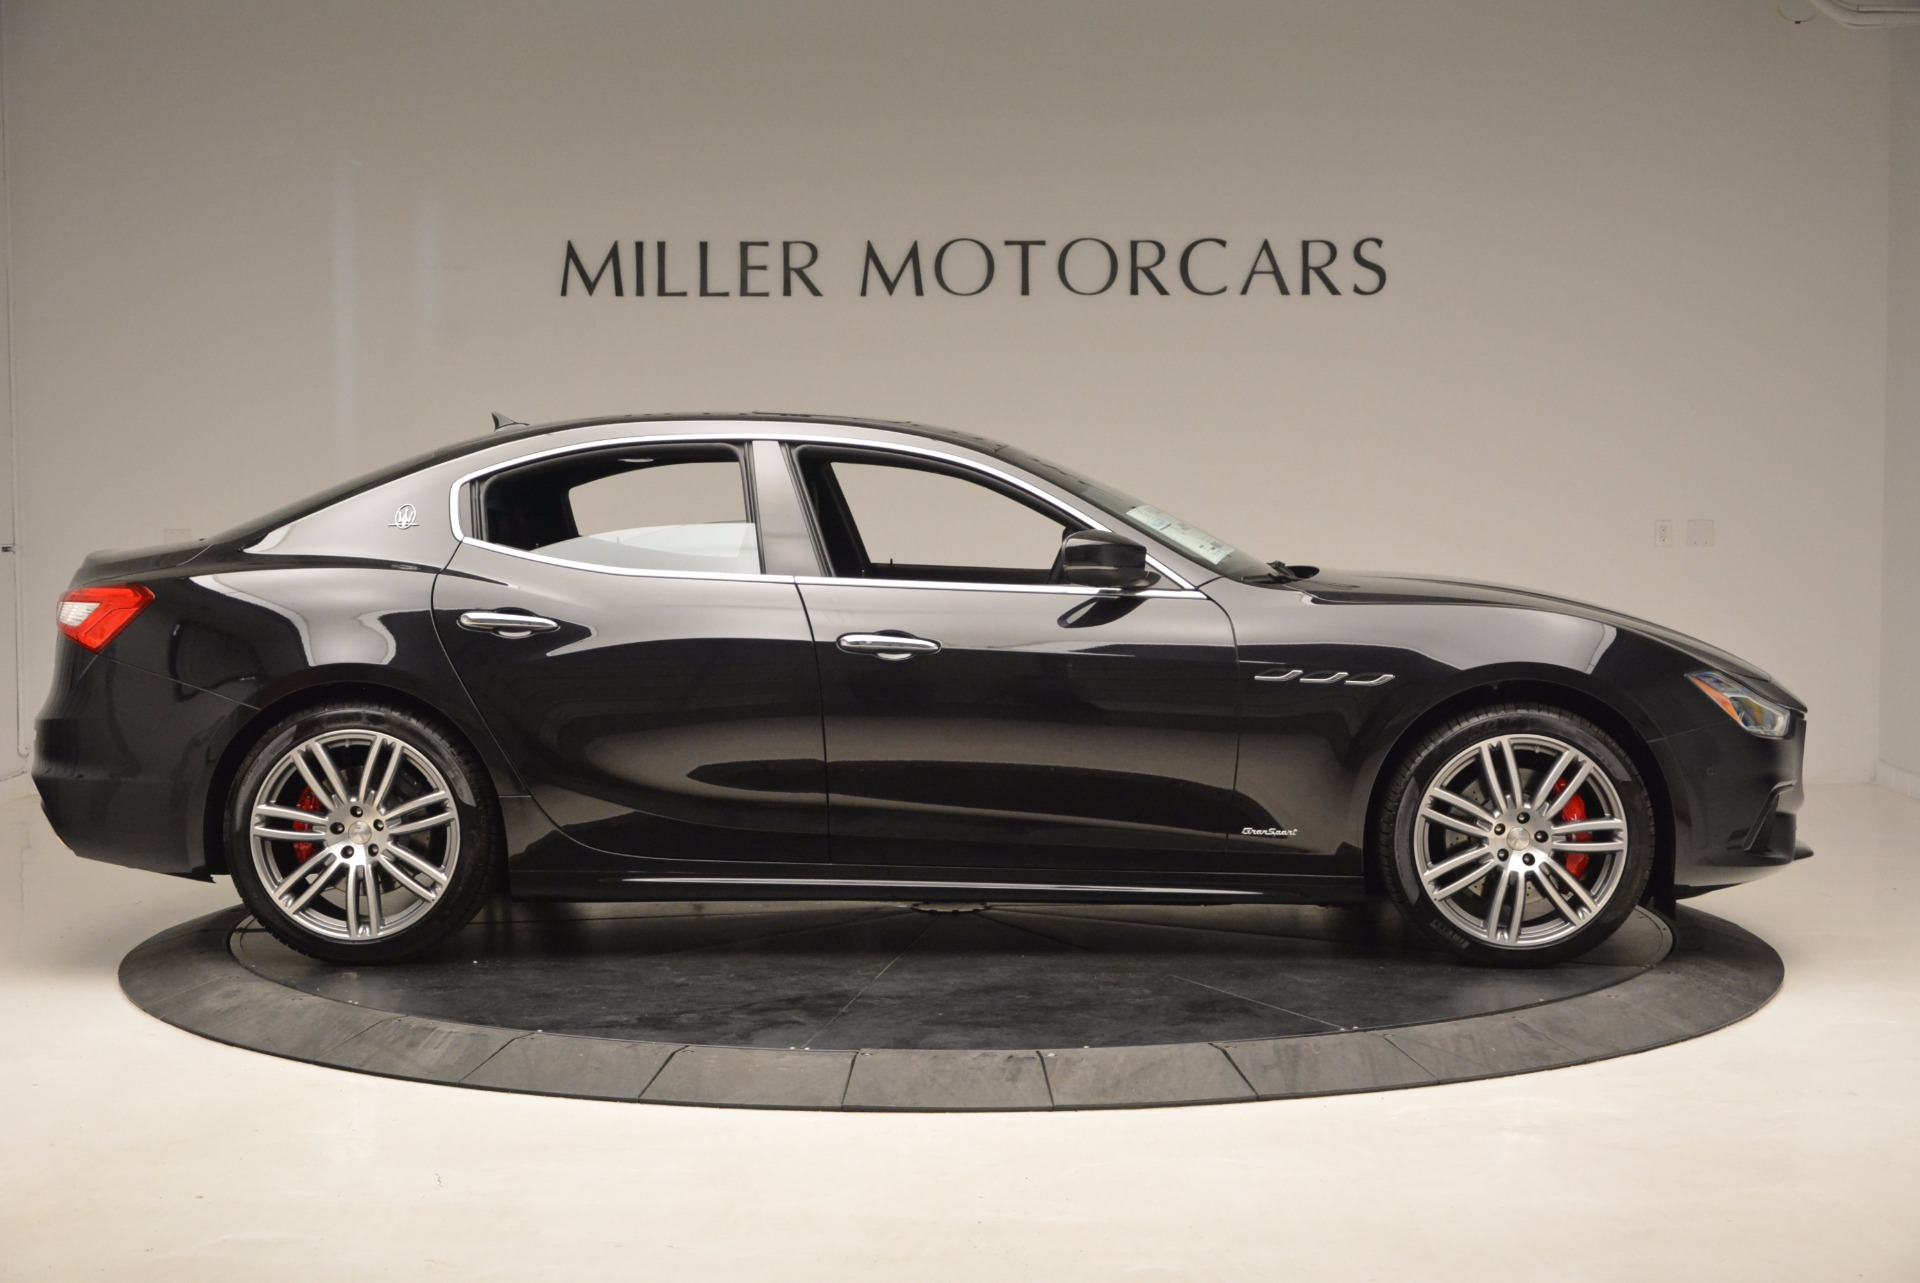 New 2018 Maserati Ghibli S Q4 GranSport For Sale In Westport, CT 1541_p9